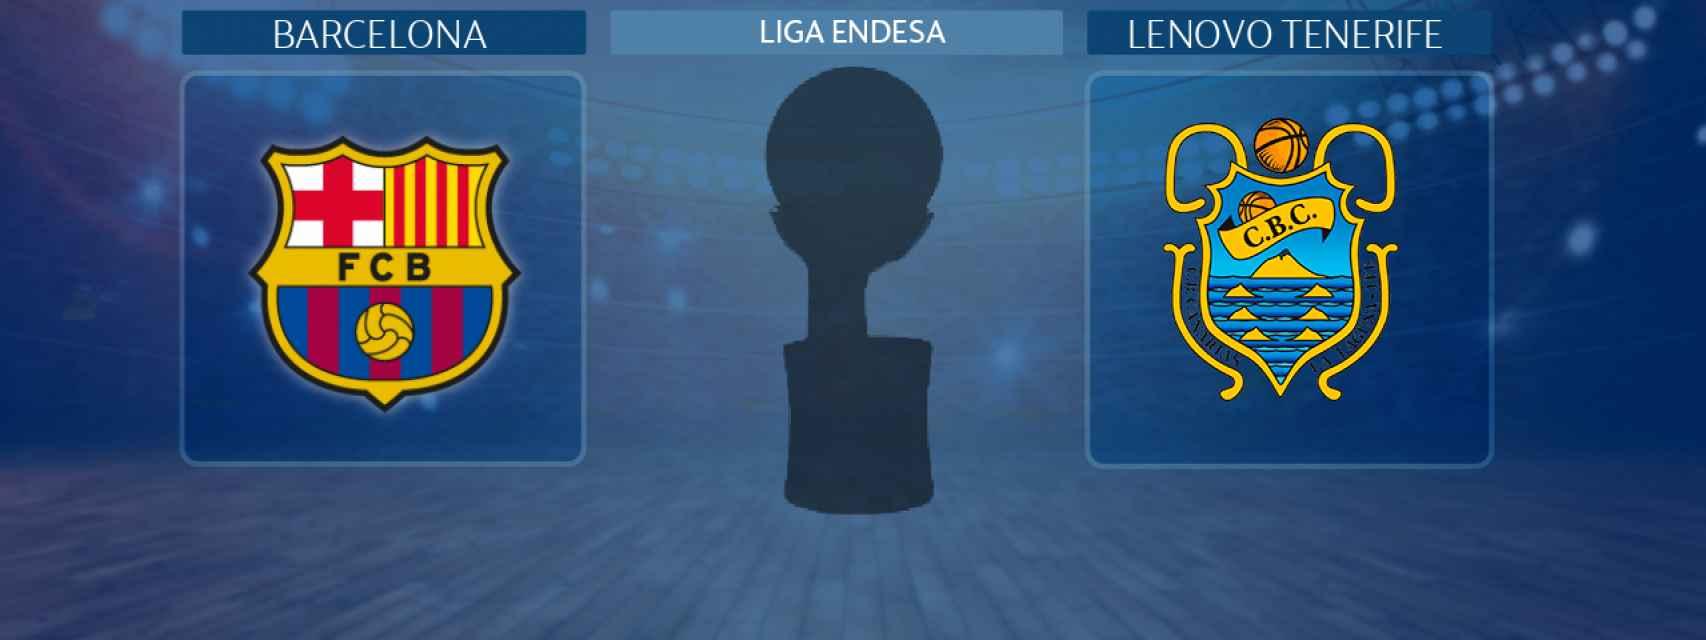 Barcelona - Lenovo Tenerife, semifinal de la Liga Endesa